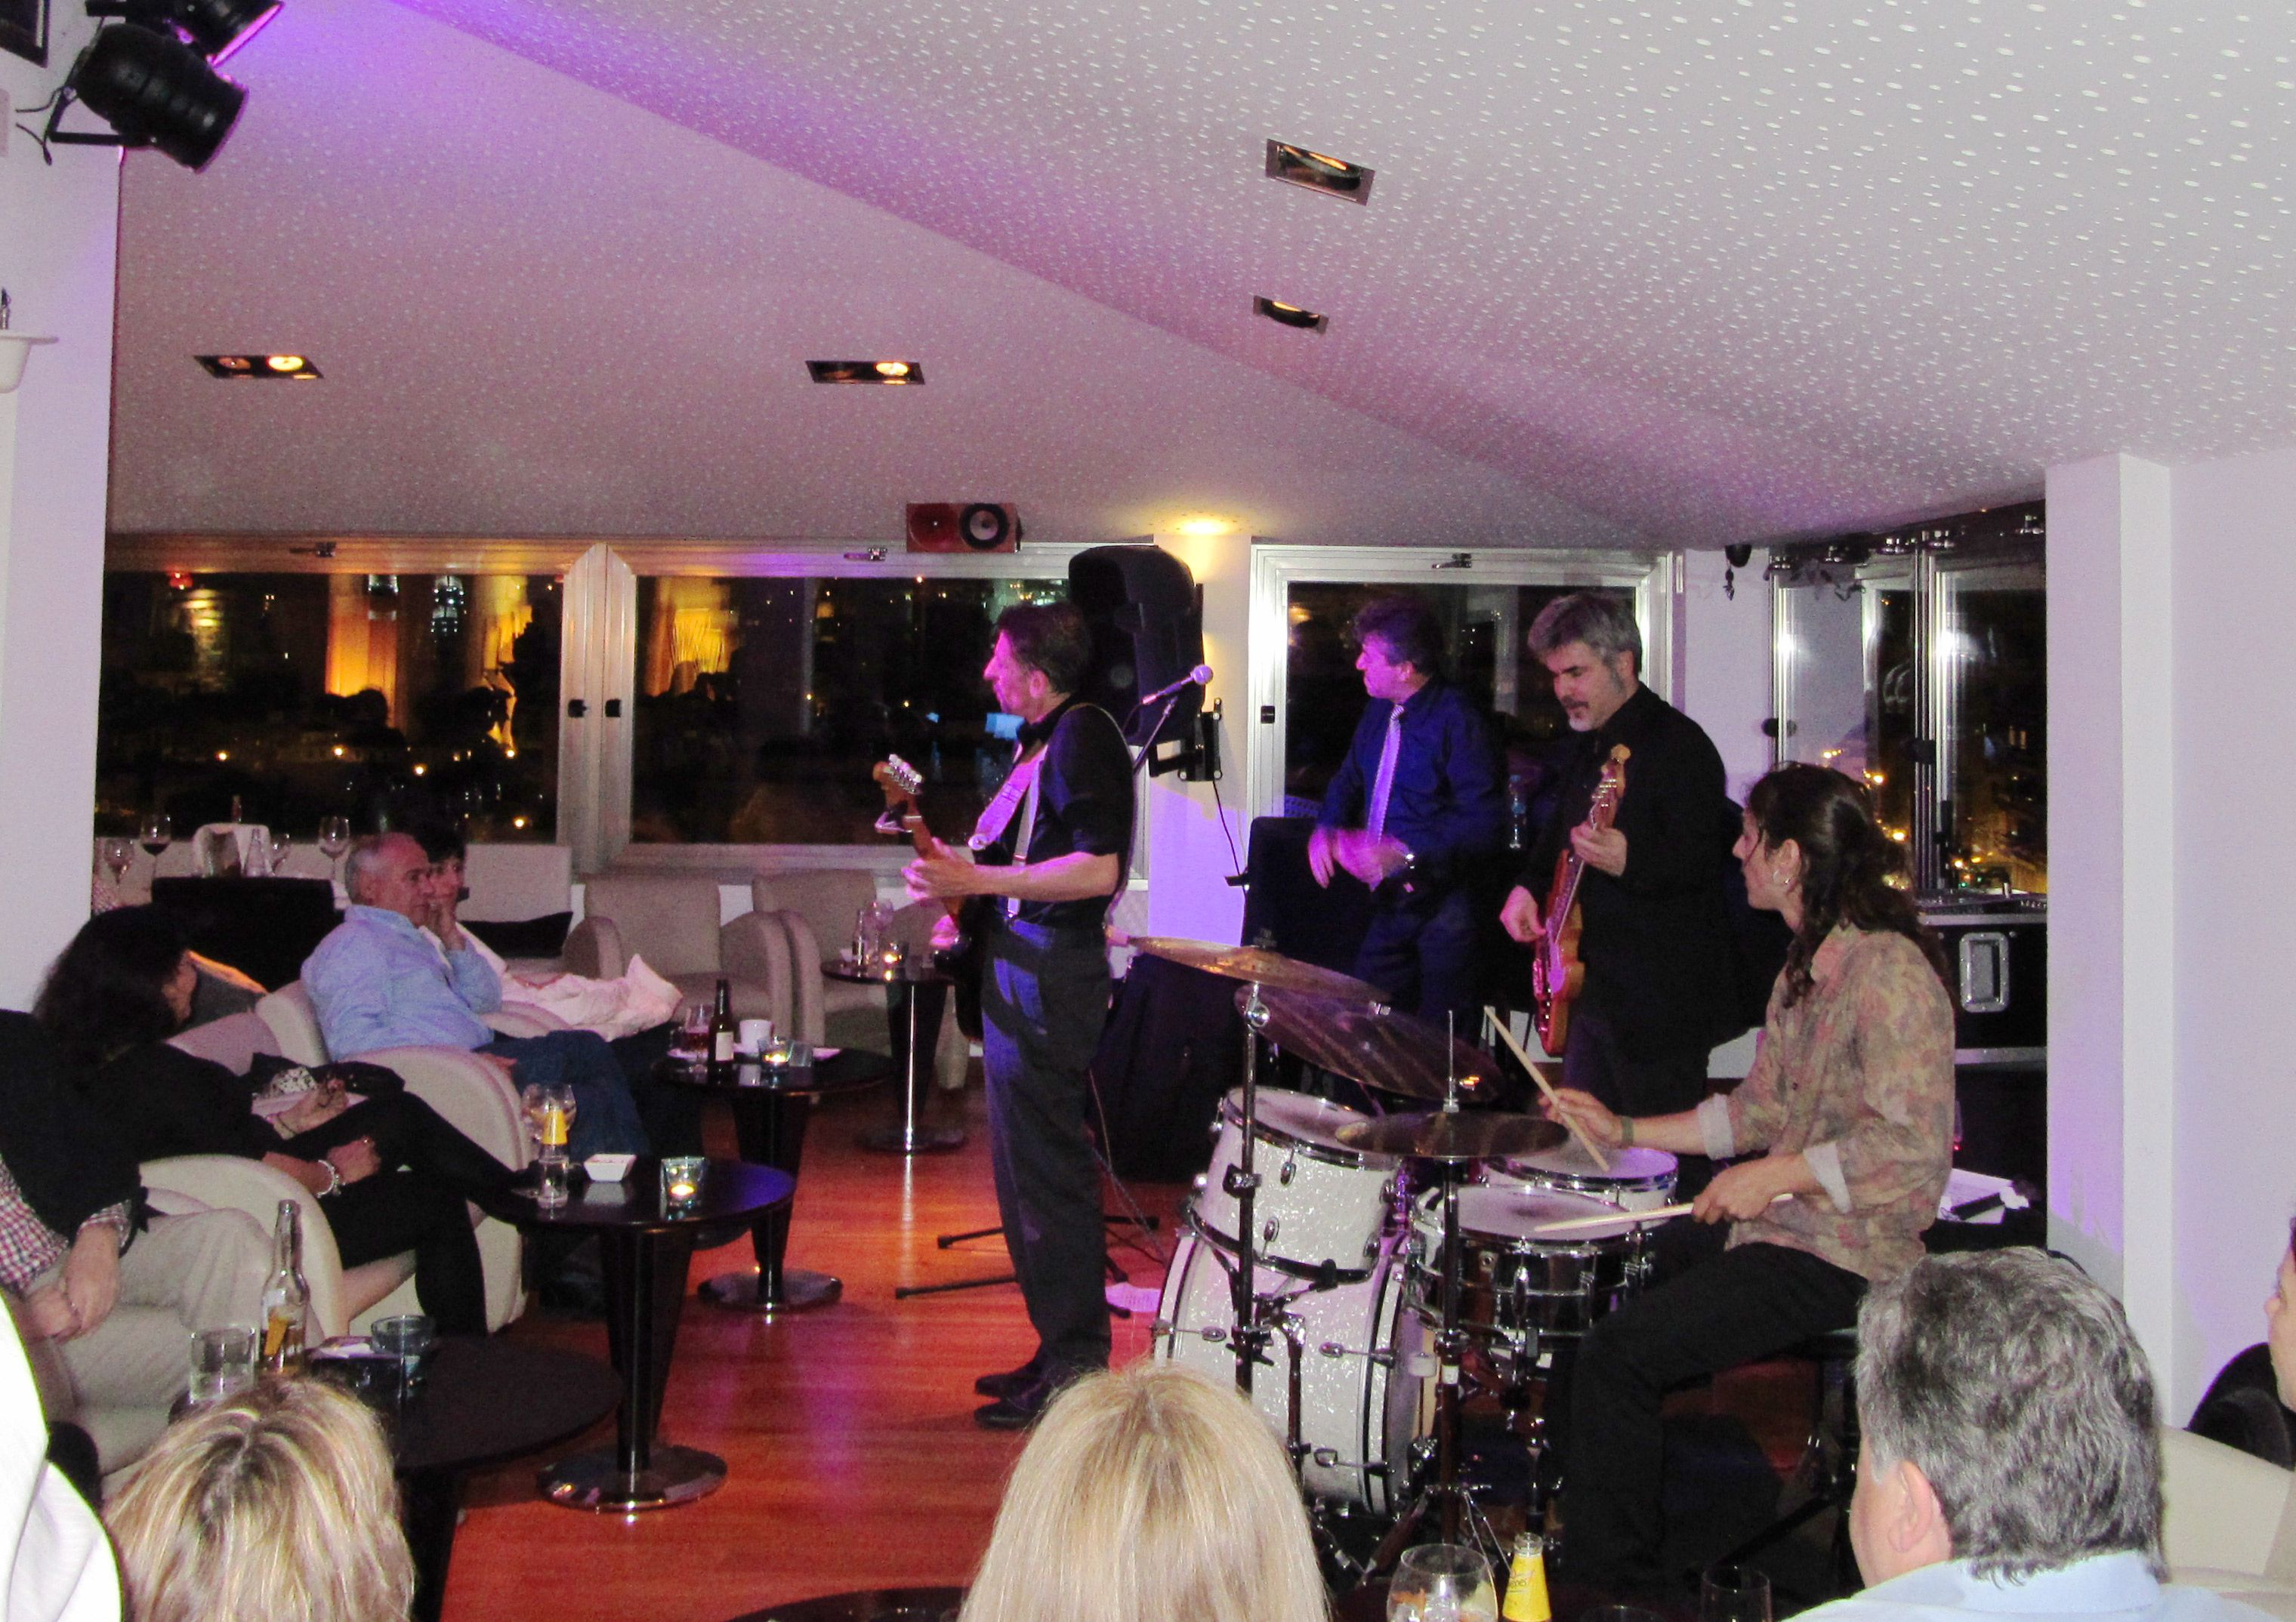 Concierto Mingo The Blues Intruders Concierto Hotel De Lujo Palma De Mallorca